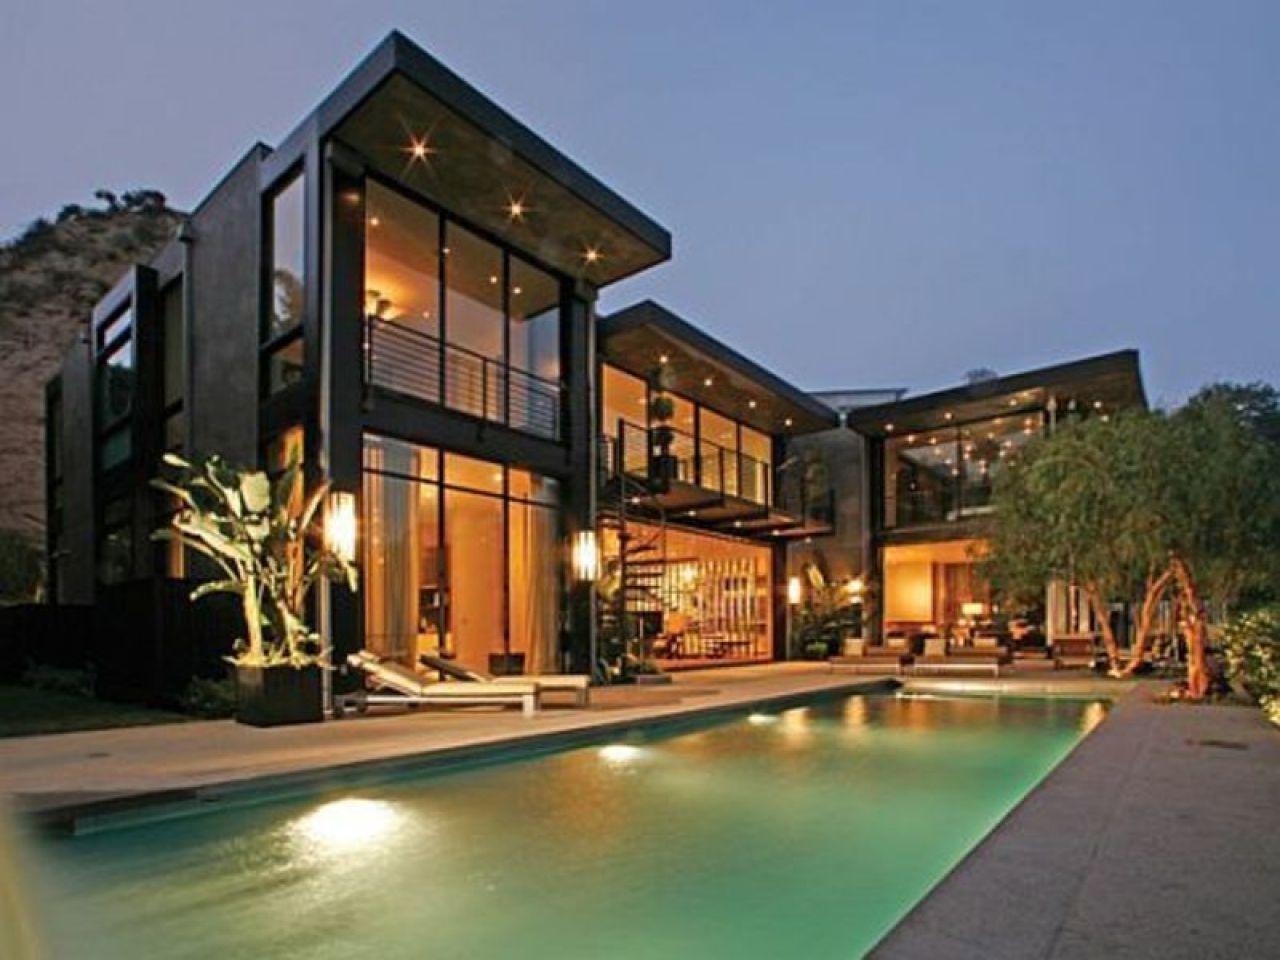 Modular Home Designs Modular Homes Vt The Blanco House Prefab Luxury Two Story Modular Shipping Luxury House Designs Cool House Designs Architecture House